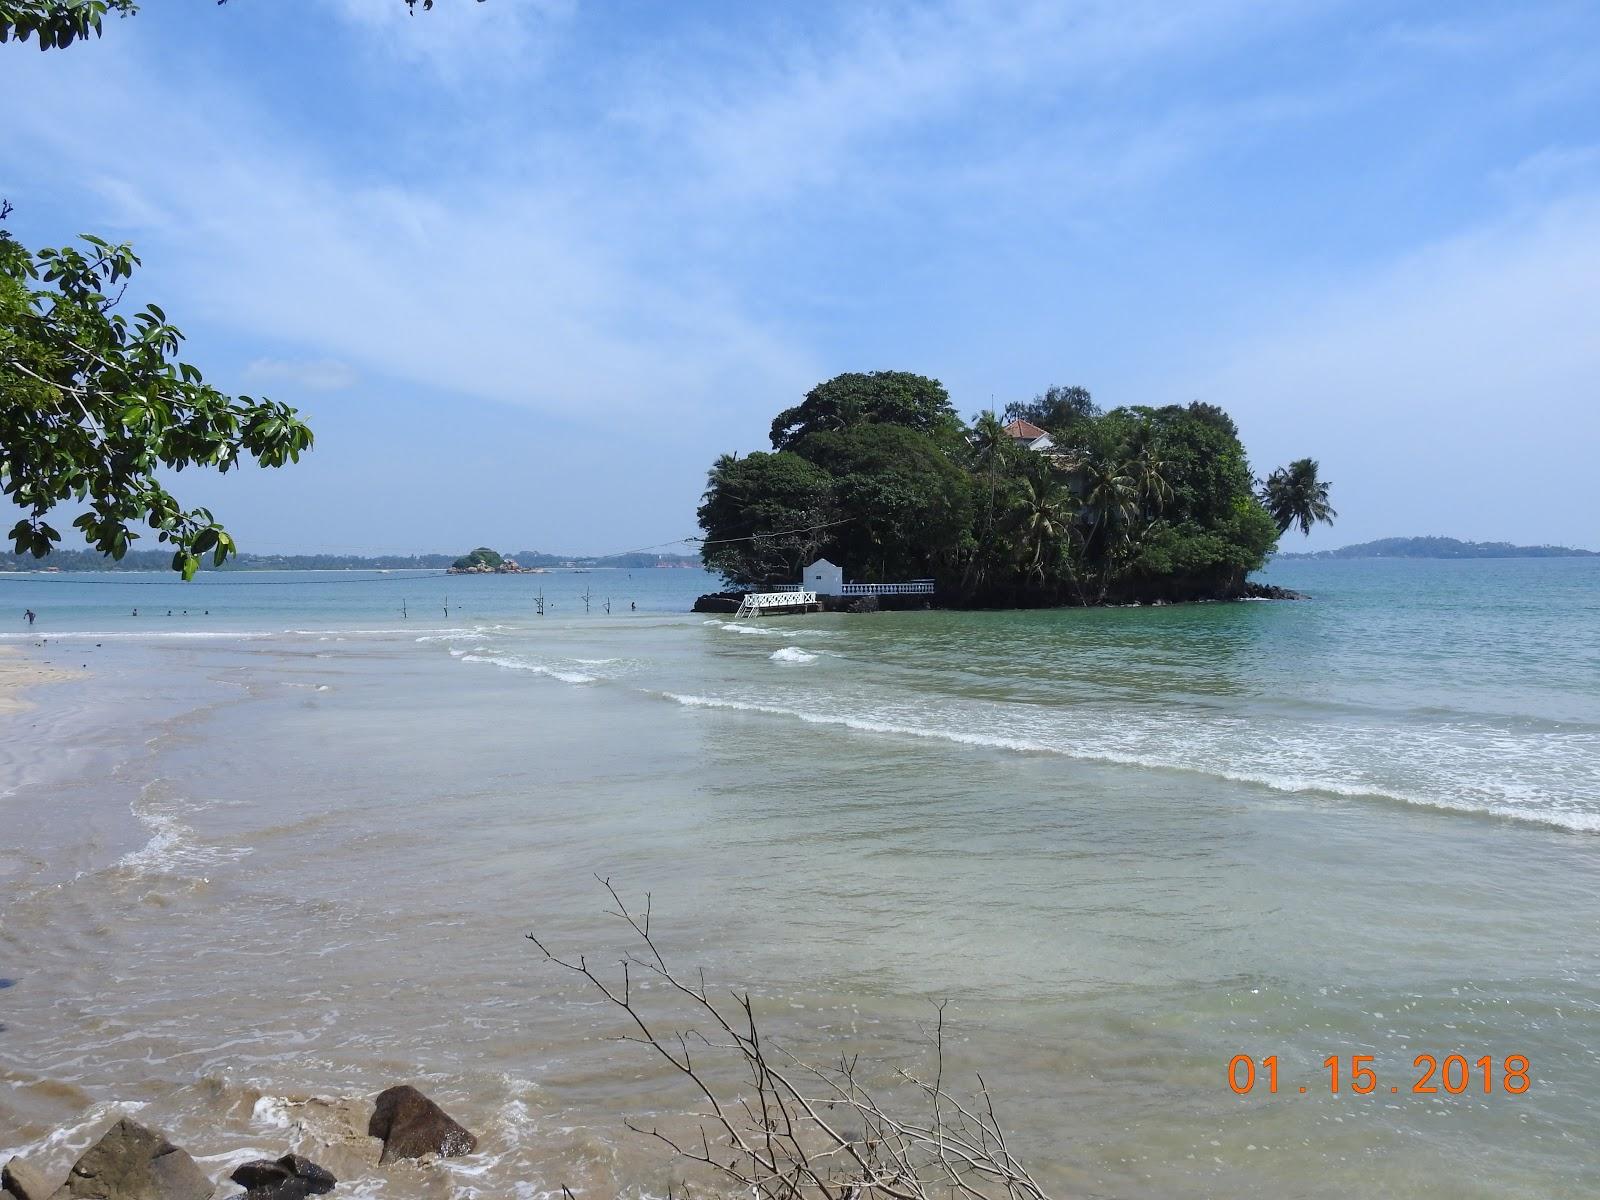 invite-to-paradise-sri-lanka-maldives-holiday-specialists-nutan-vidyut-patel-taprobane-island.jpg